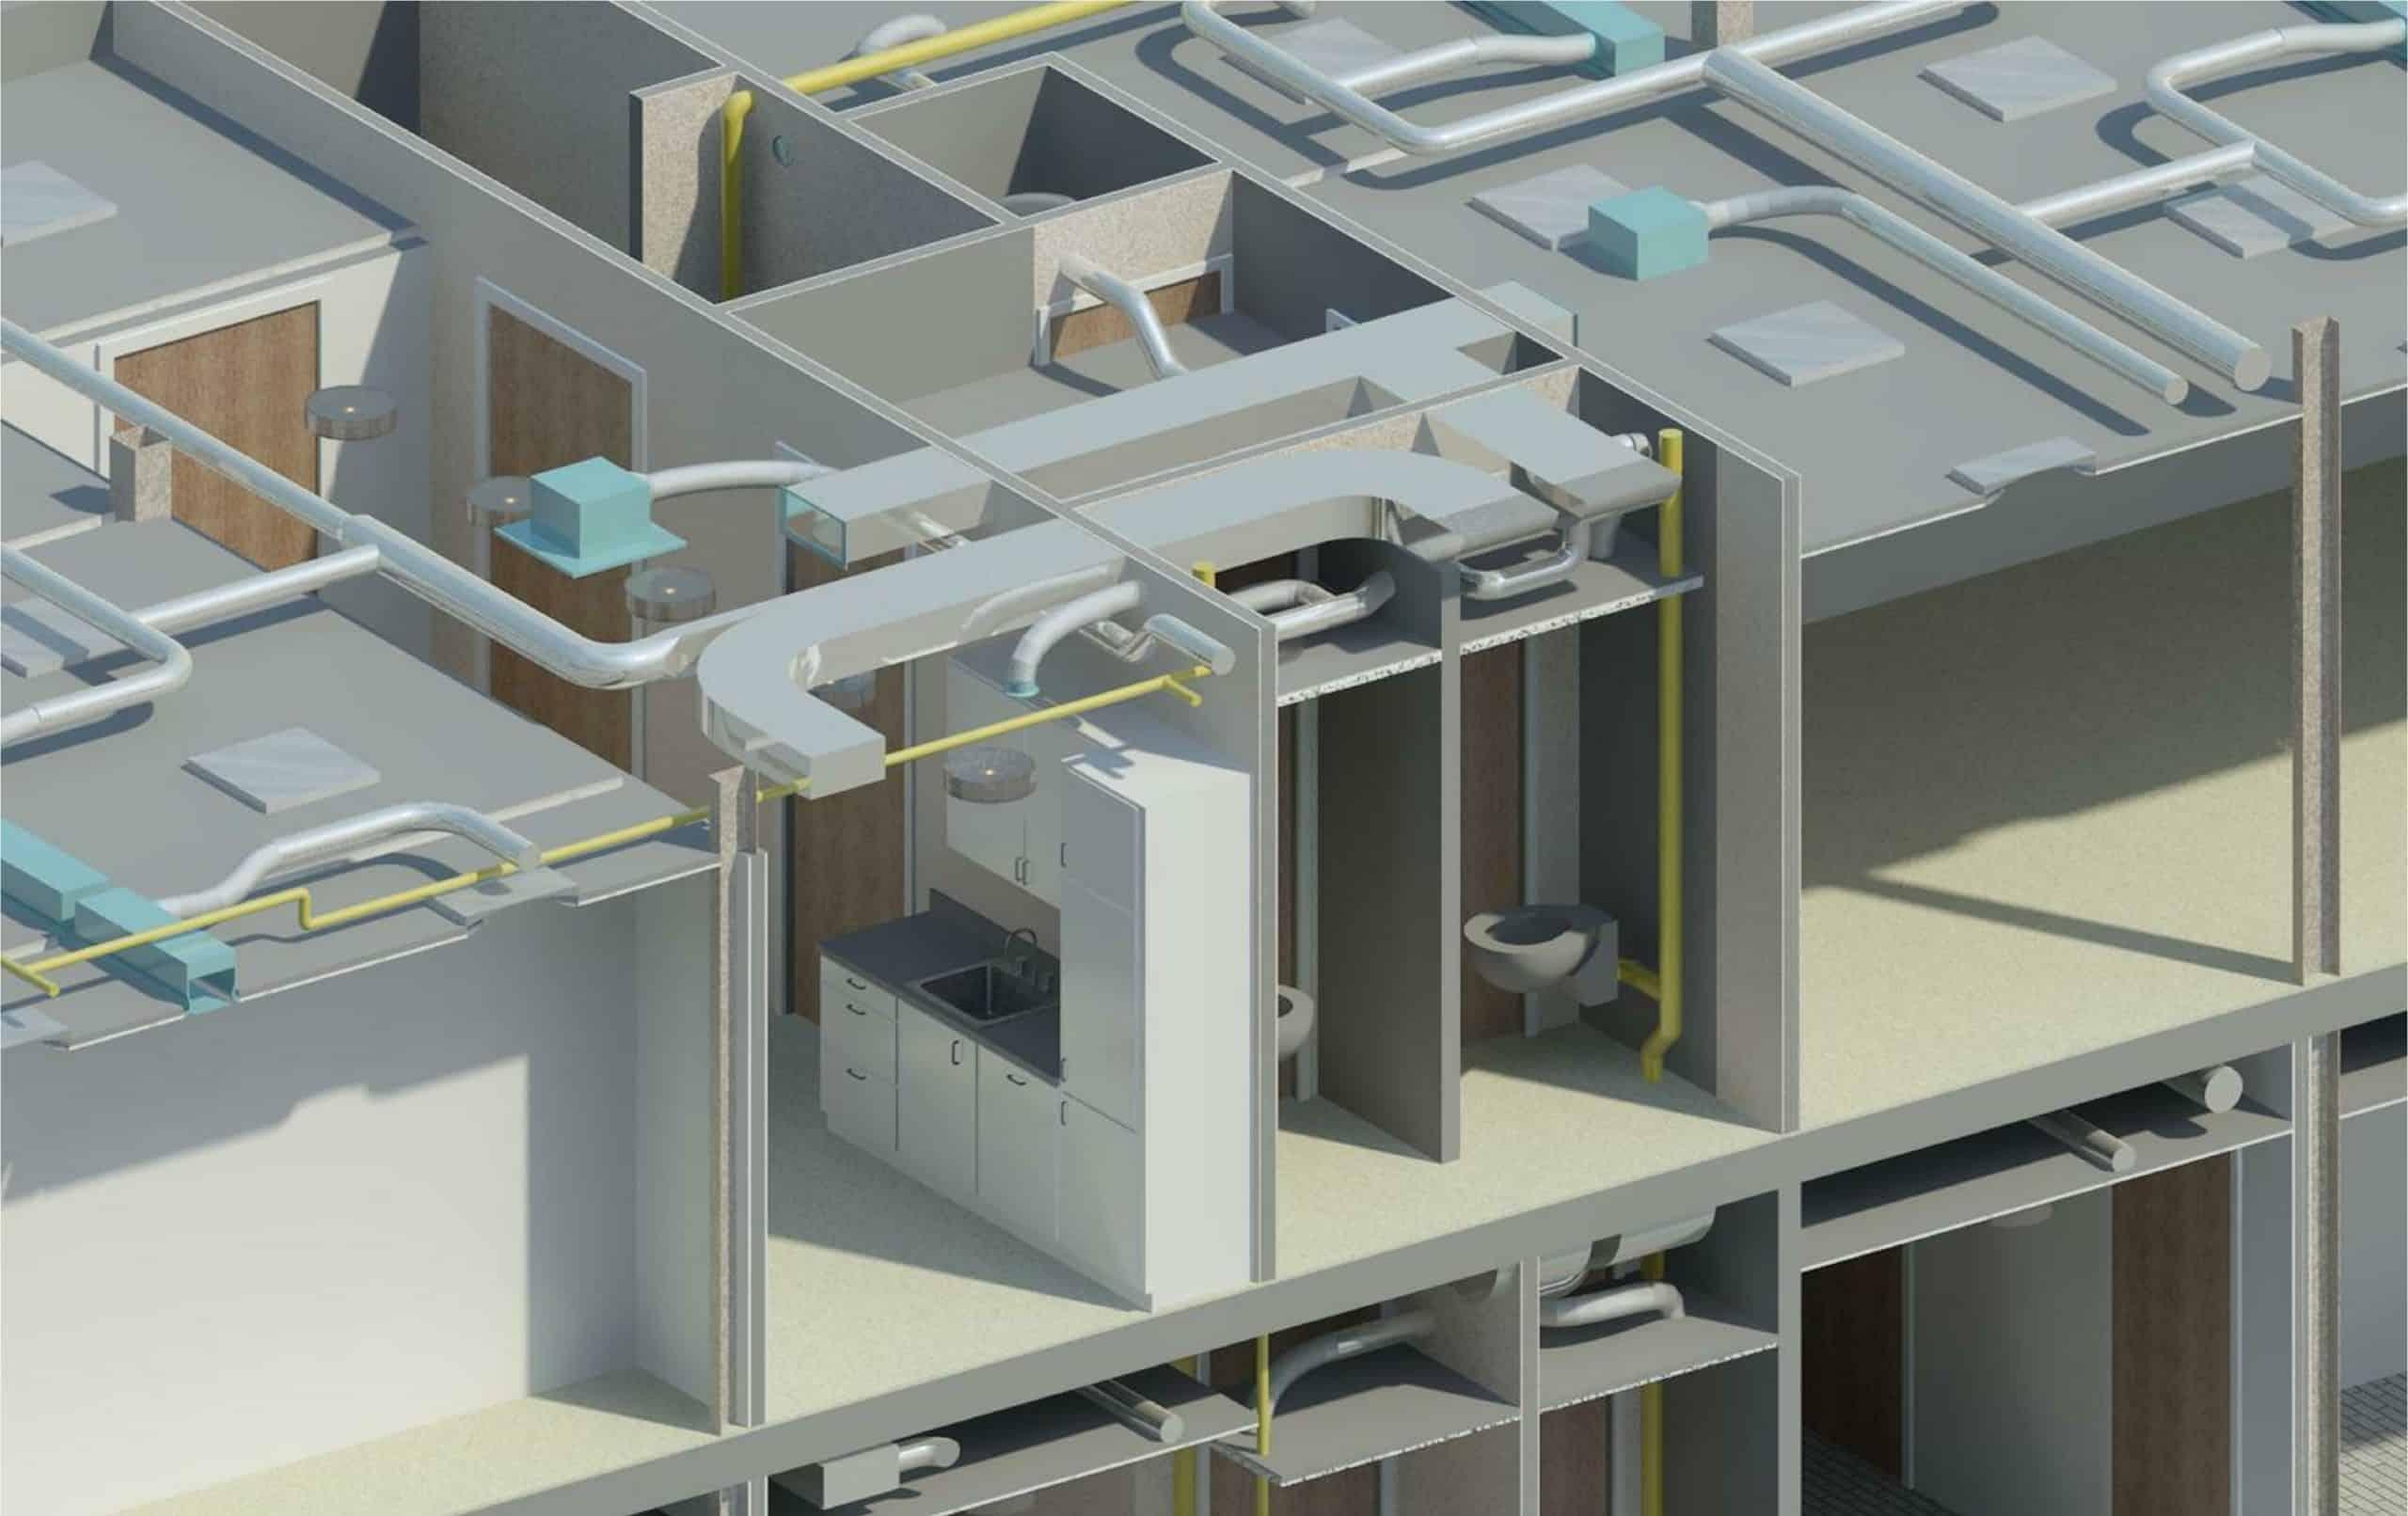 02-BIM-afbeelding-3D-1-scaled